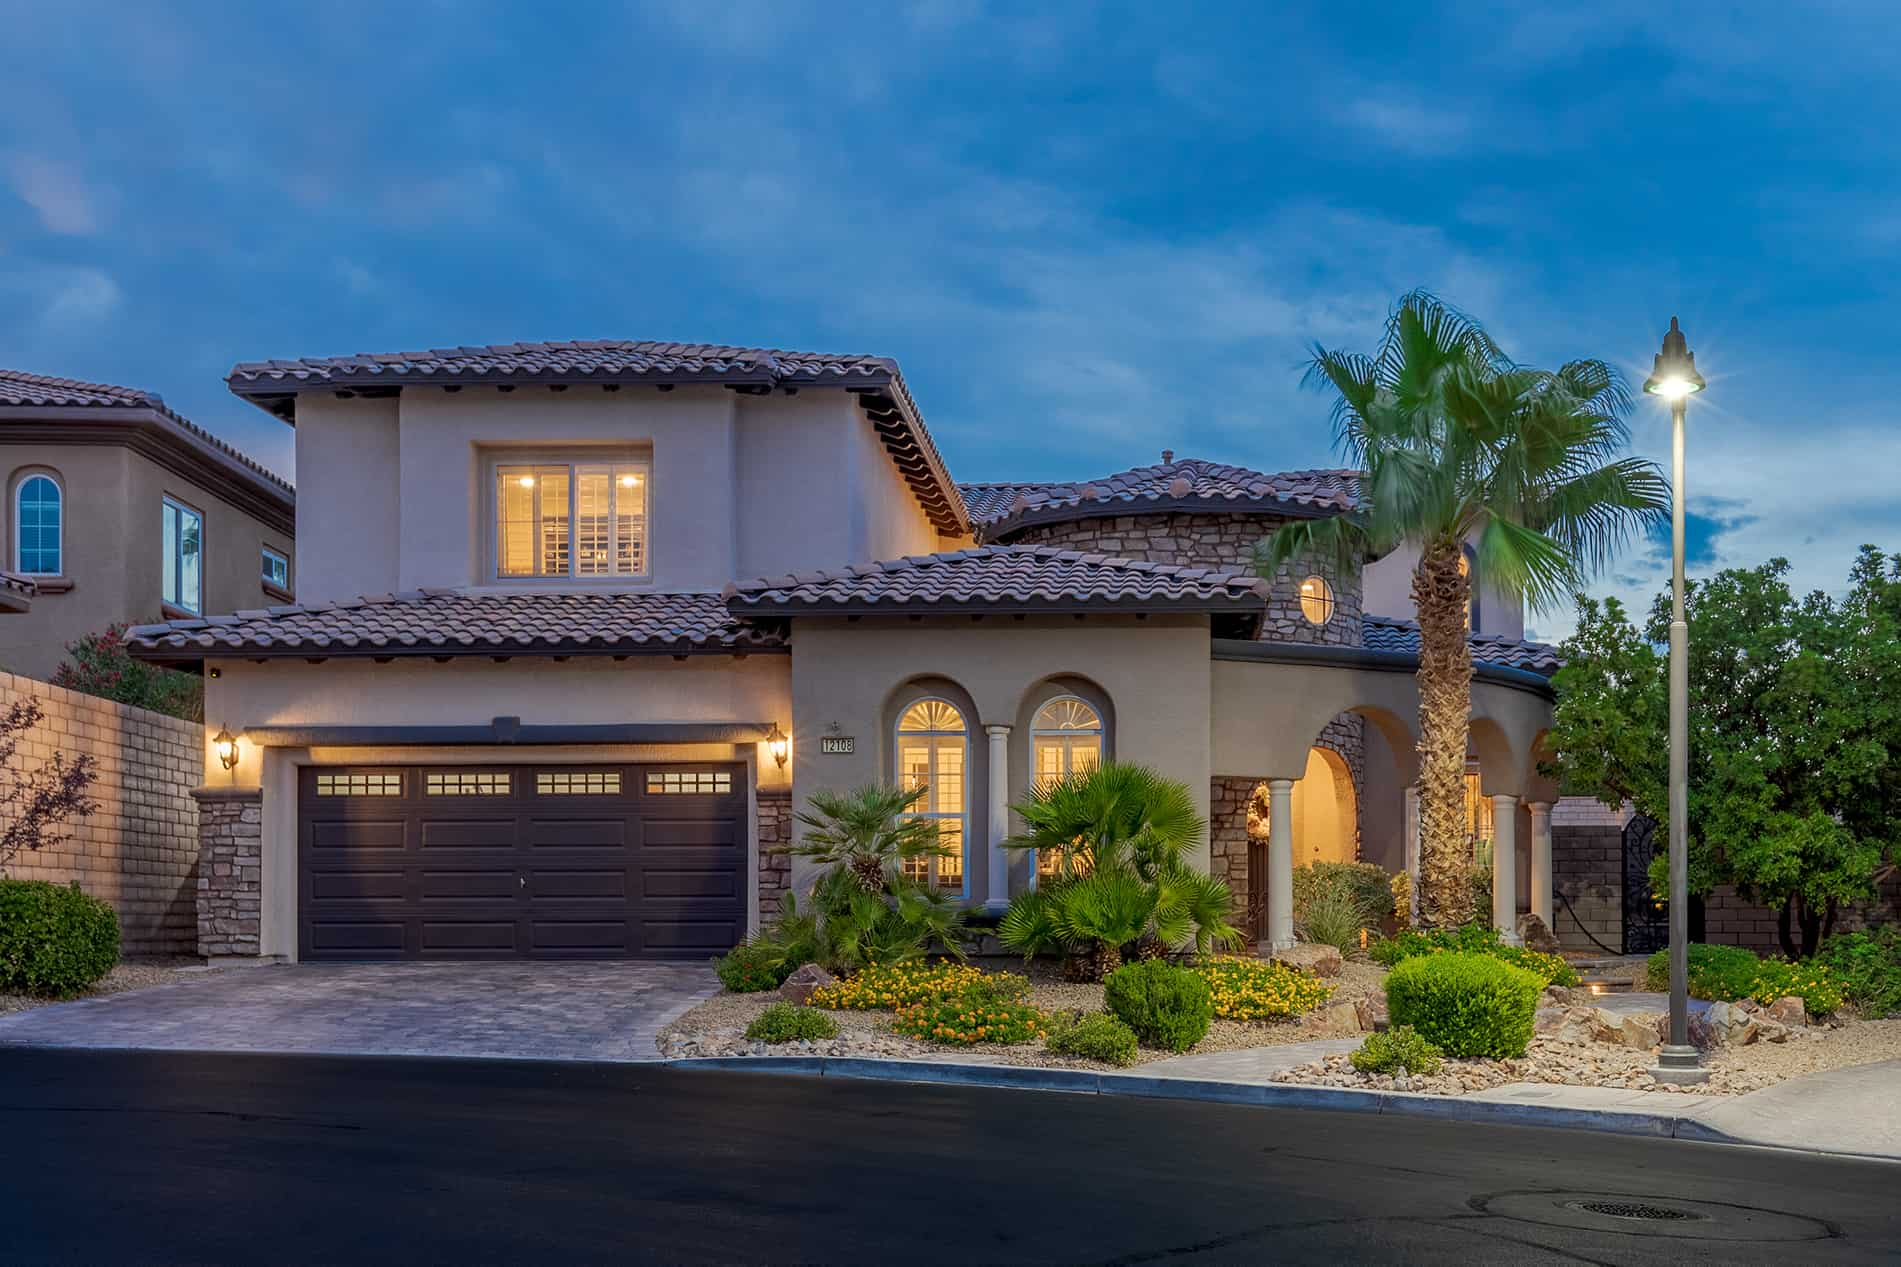 las-vegas-luxry-real-estate-realtor-rob-jensen-company-12108-vista-linda-avenue-the-paseos078